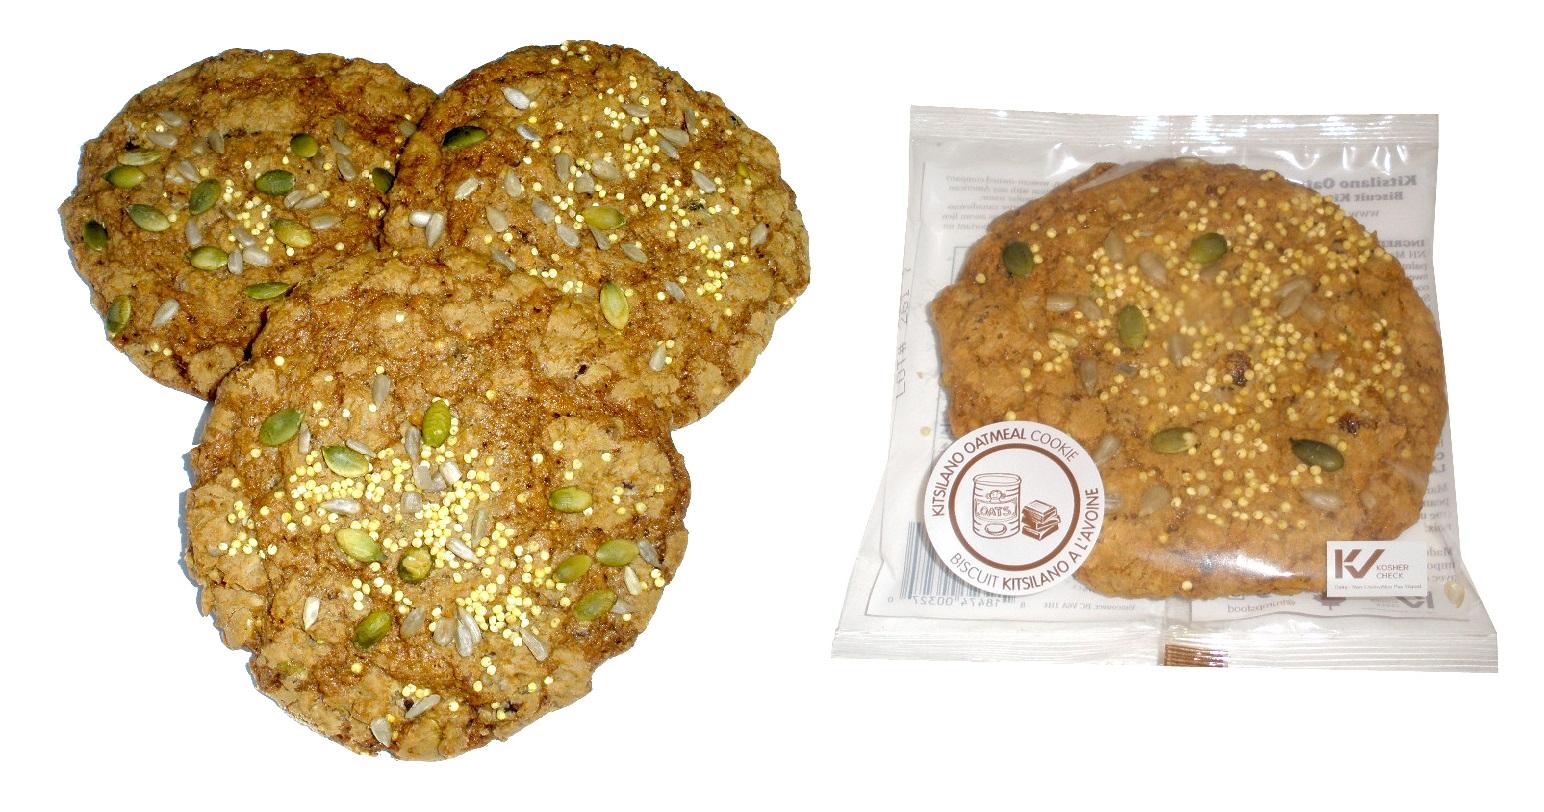 https://0901.nccdn.net/4_2/000/000/017/e75/Kitsilano-Cookies-2017.jpg